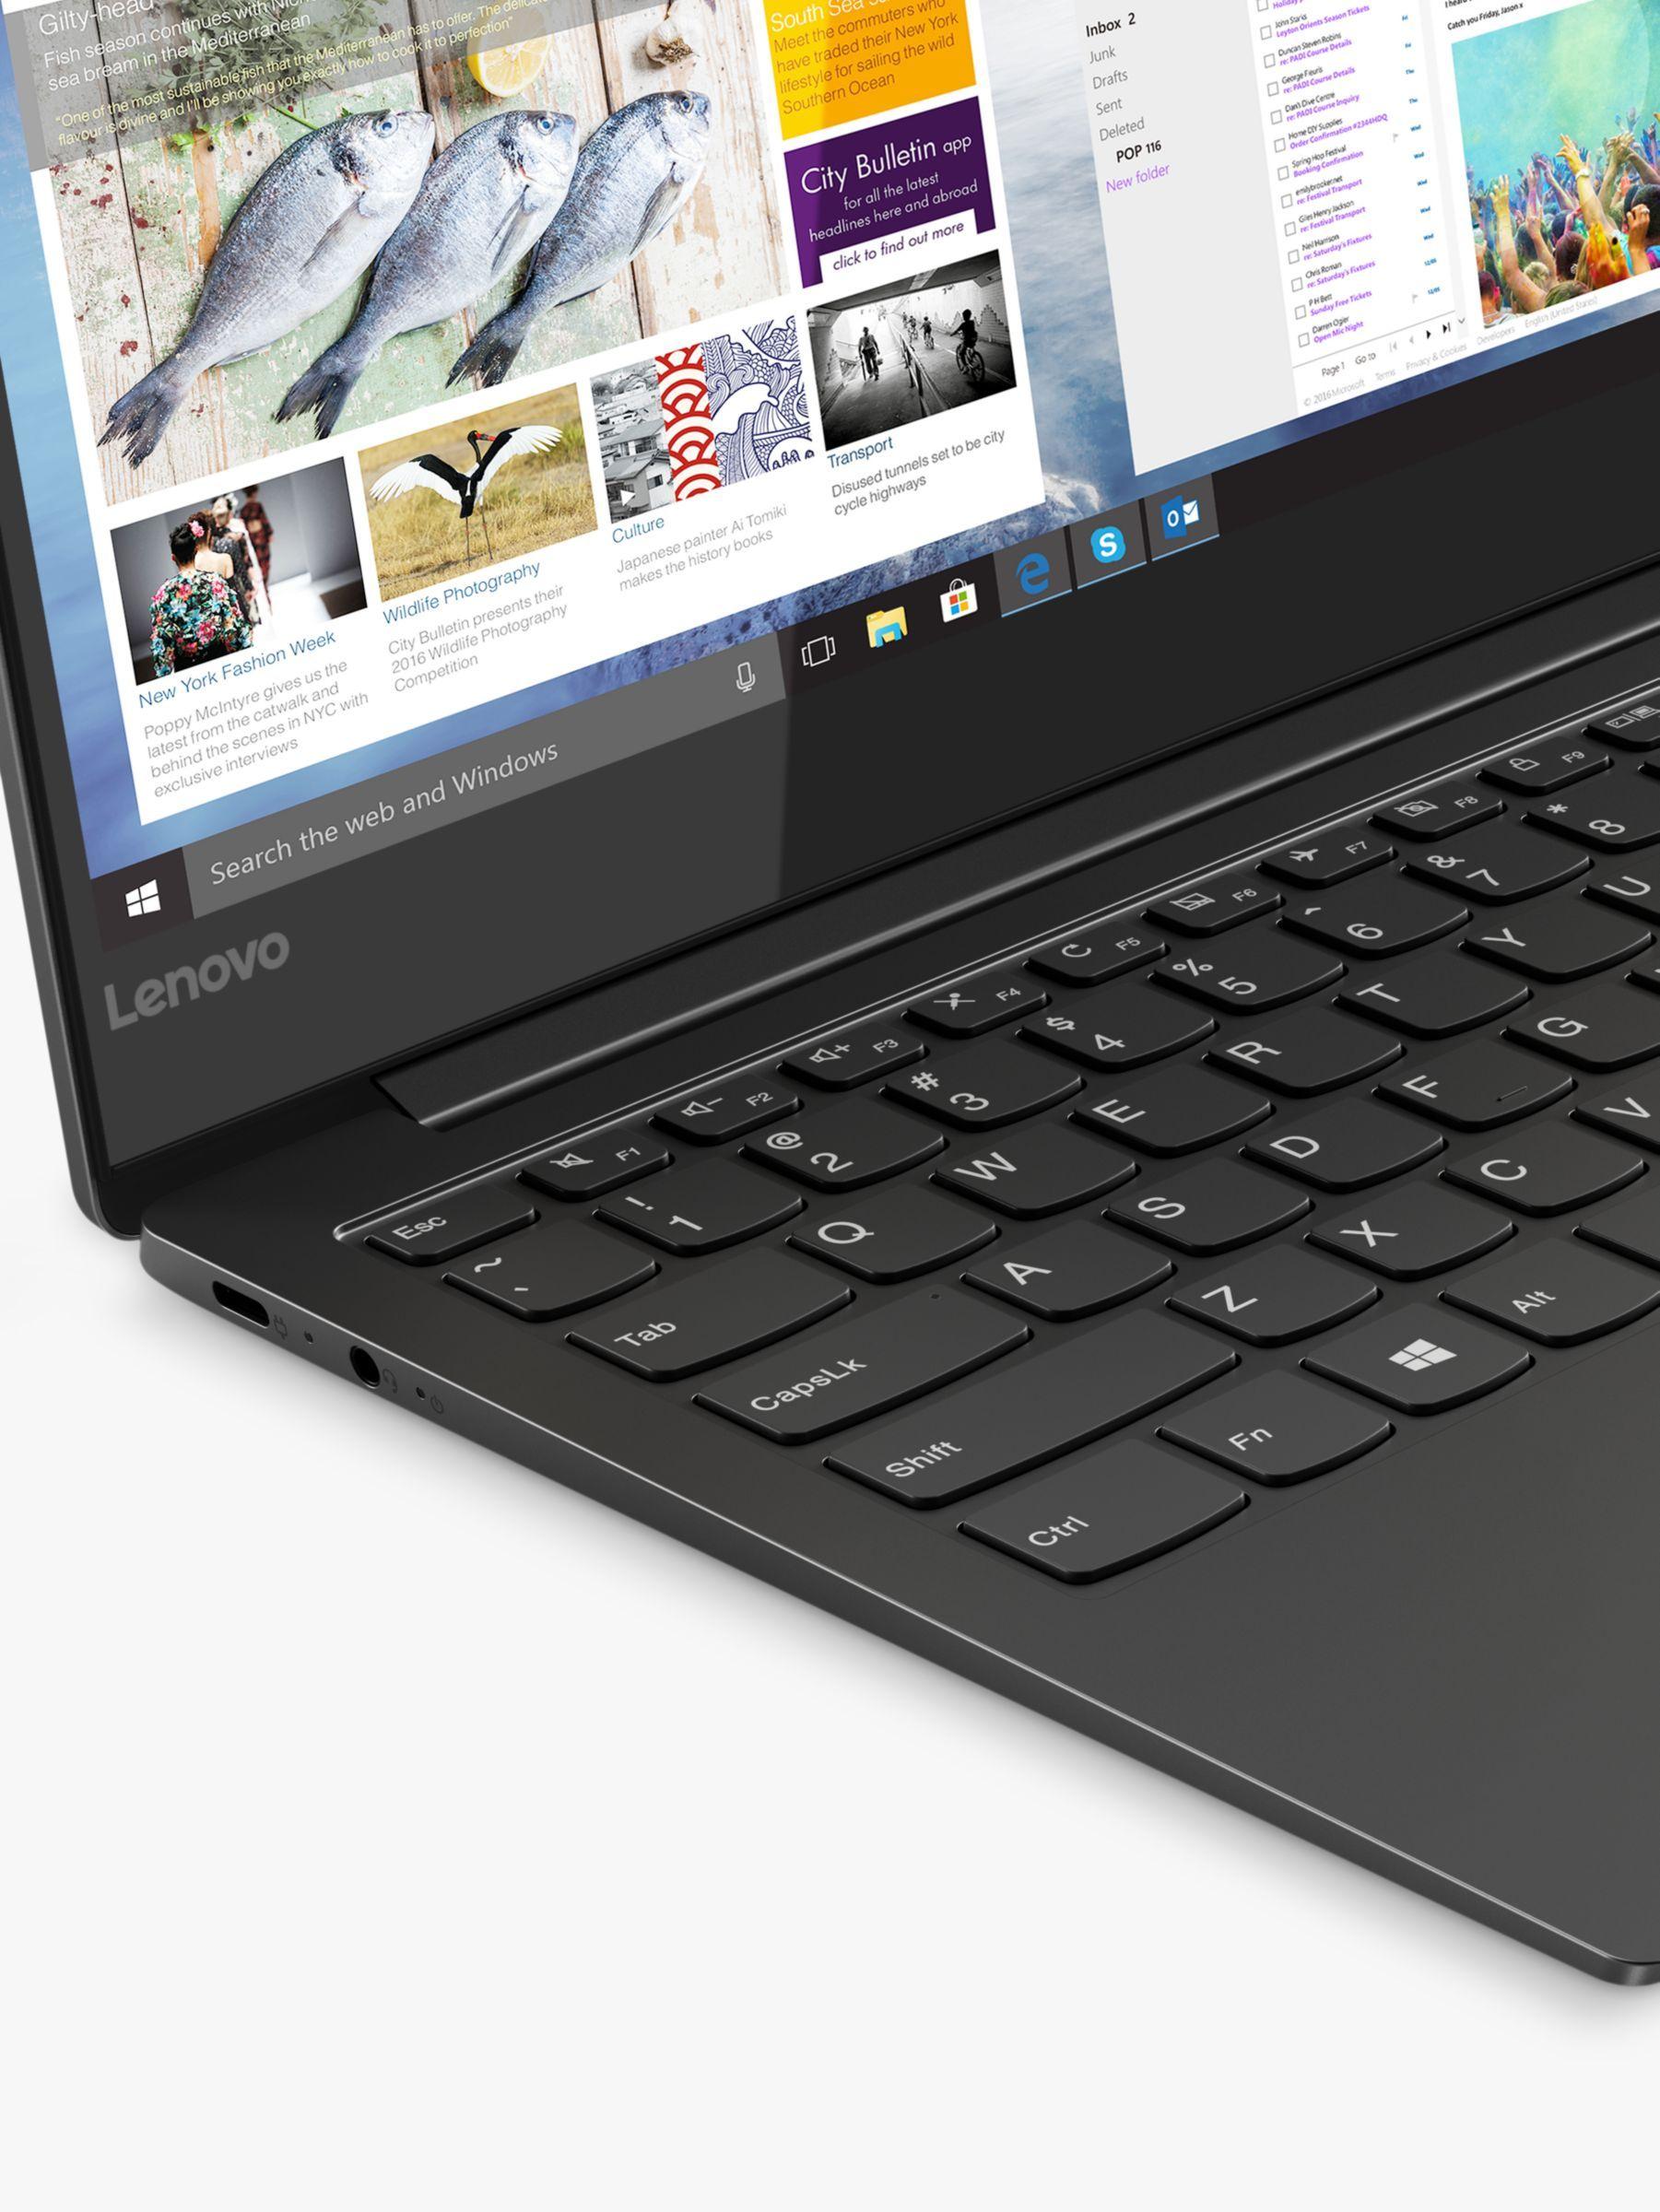 Lenovo Yoga S730 81j0000nuk Laptop Intel Core I5 Processor 8gb Ram 256gb Ssd 13 3 Full Hd Iron Grey Dolby Audio